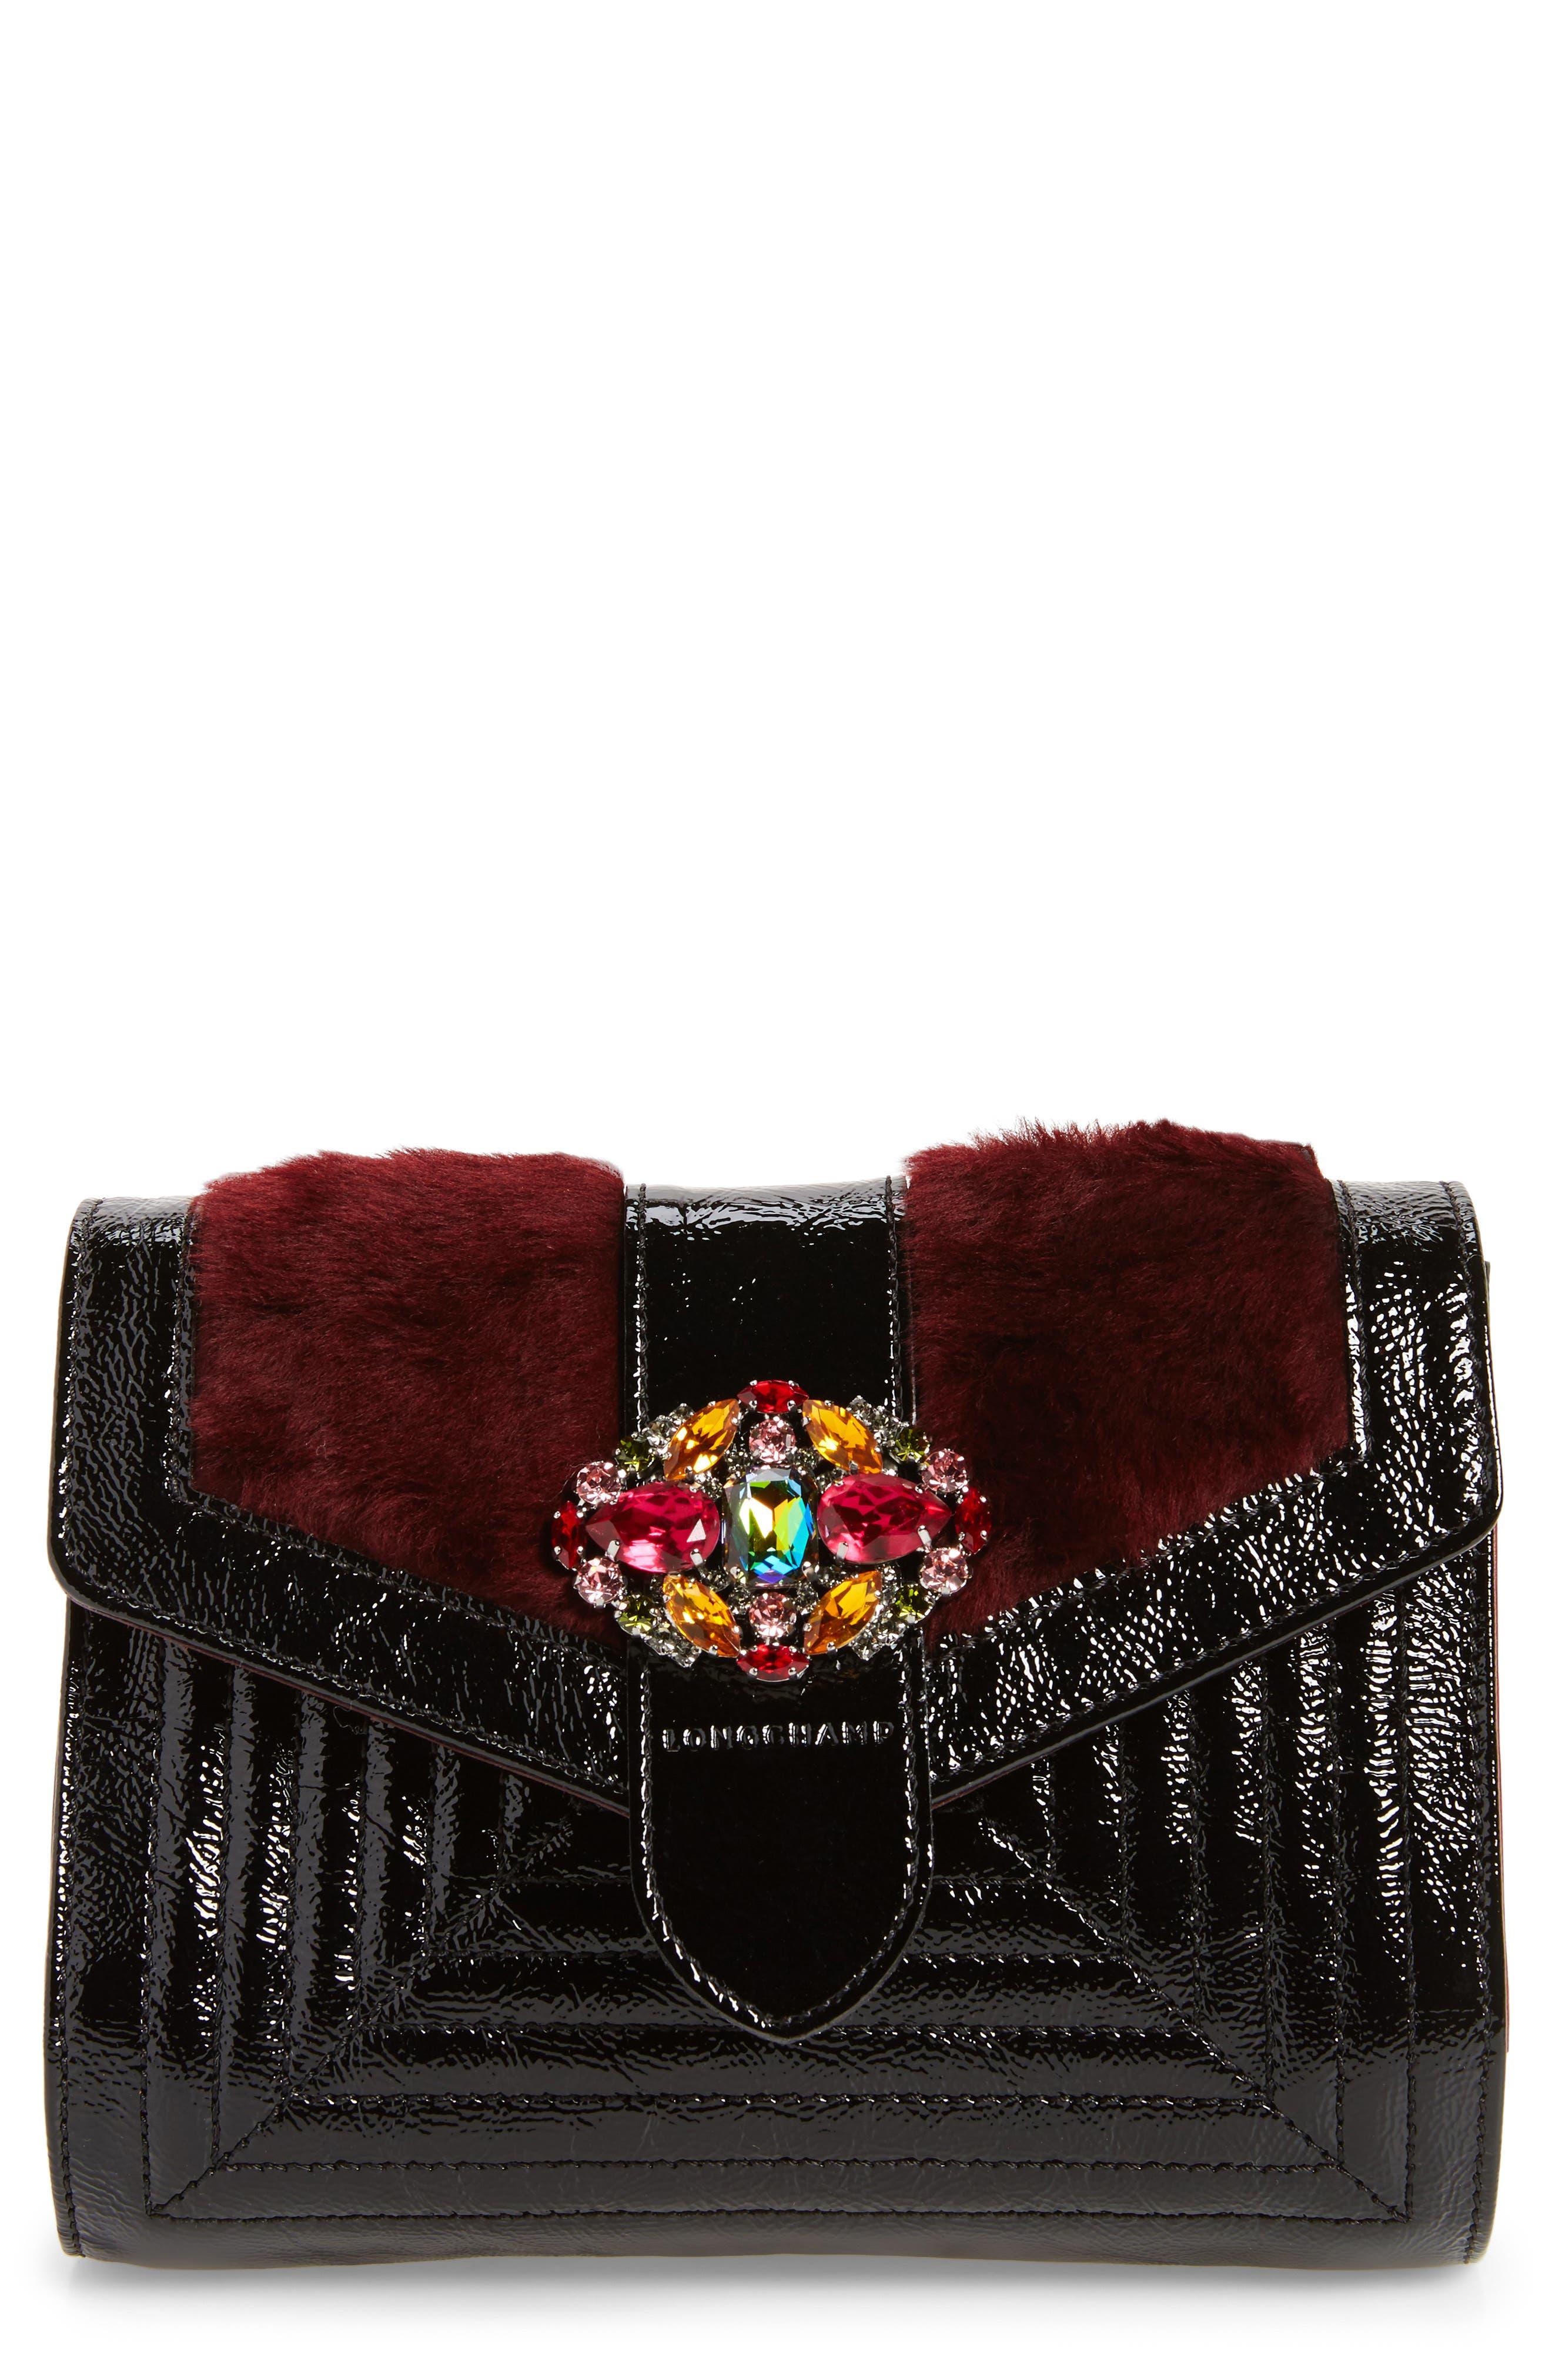 La Baronne Genuine Shearling Trim Leather Clutch,                             Main thumbnail 1, color,